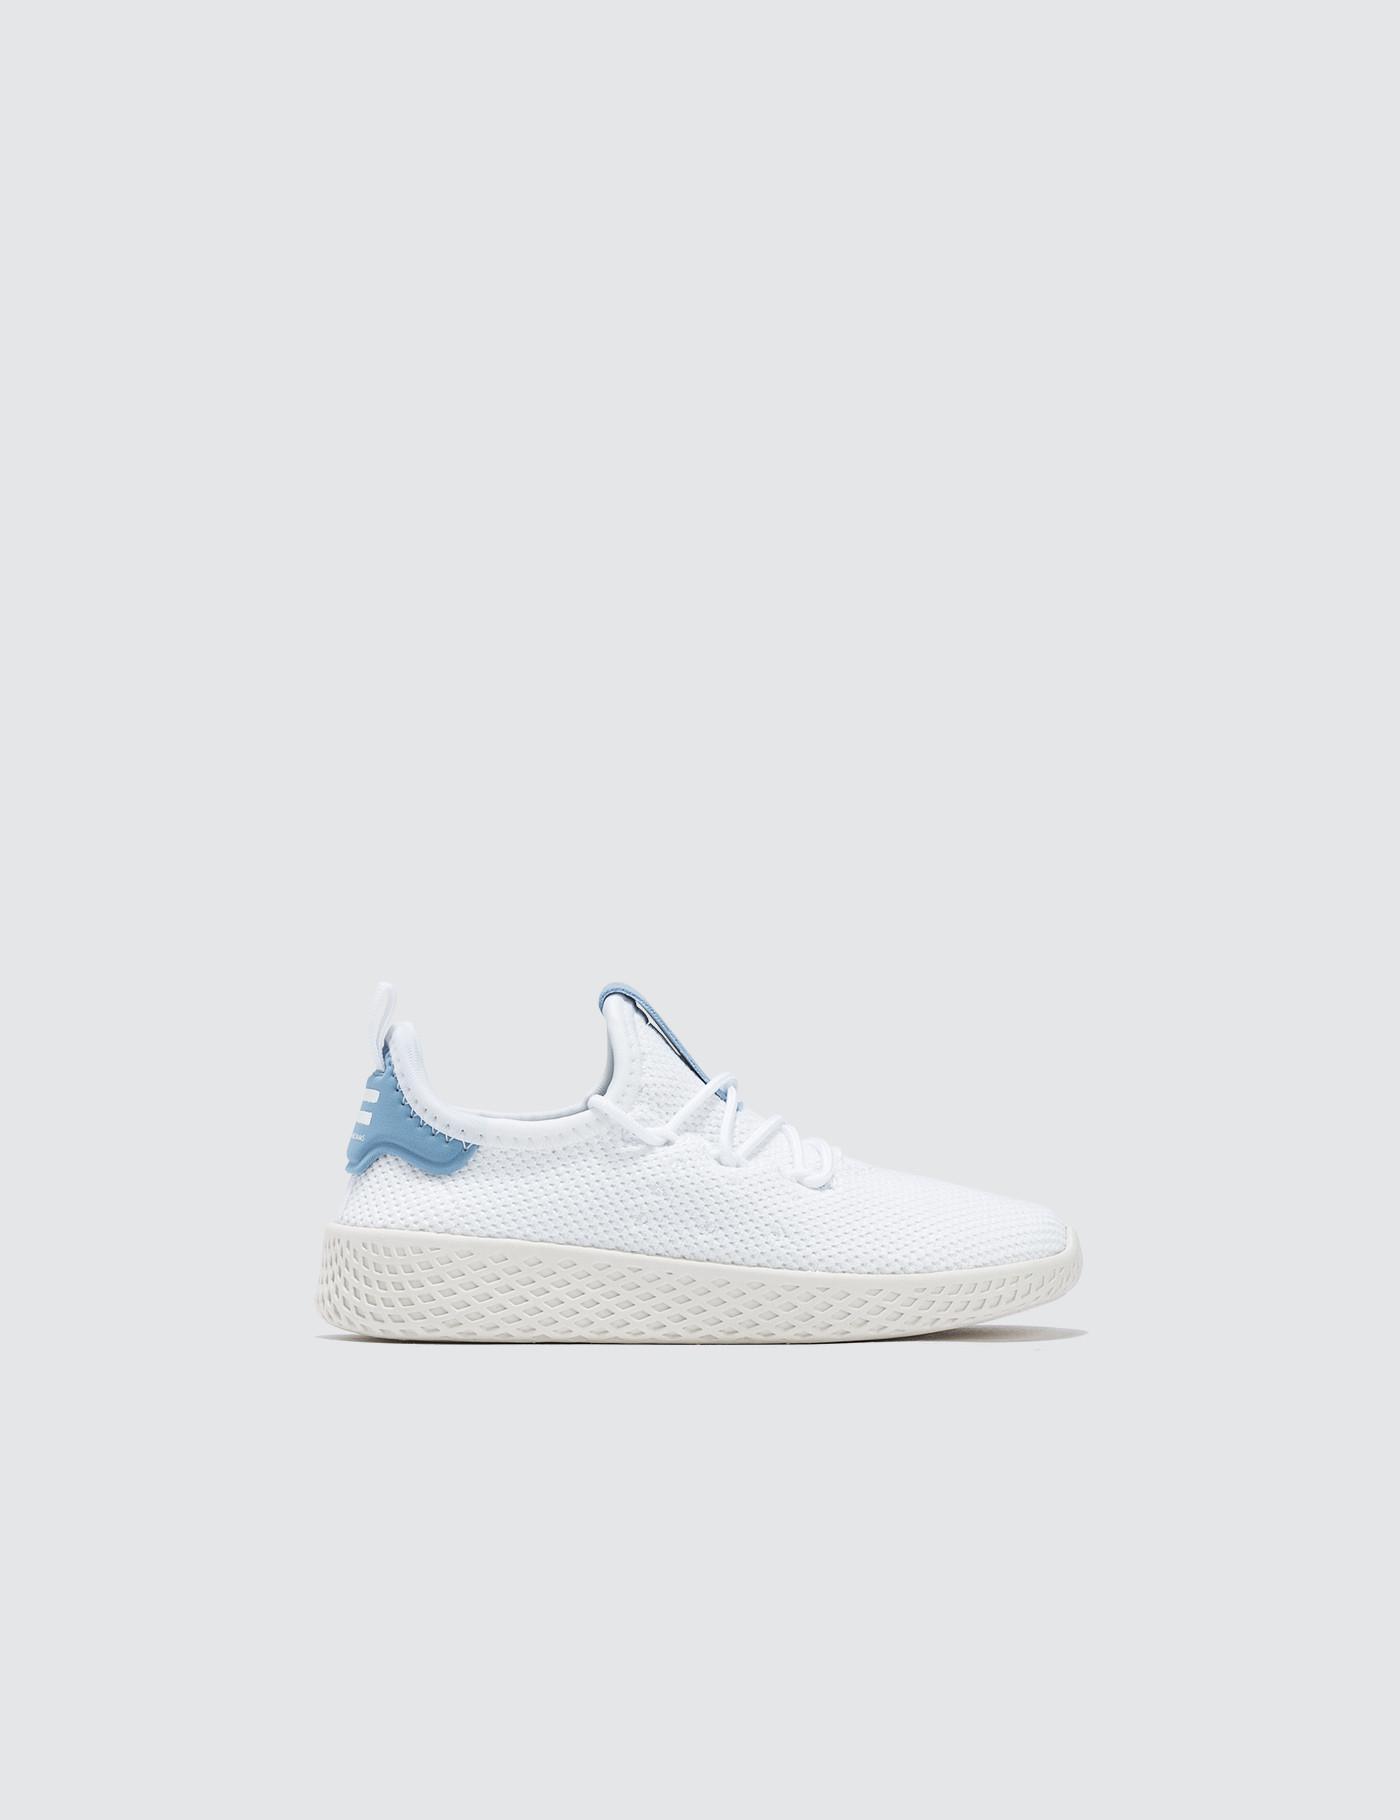 217784ef563c3 adidas Originals. Women s White Pharrell Williams X Adidas Pw Tennis Hu  Infants